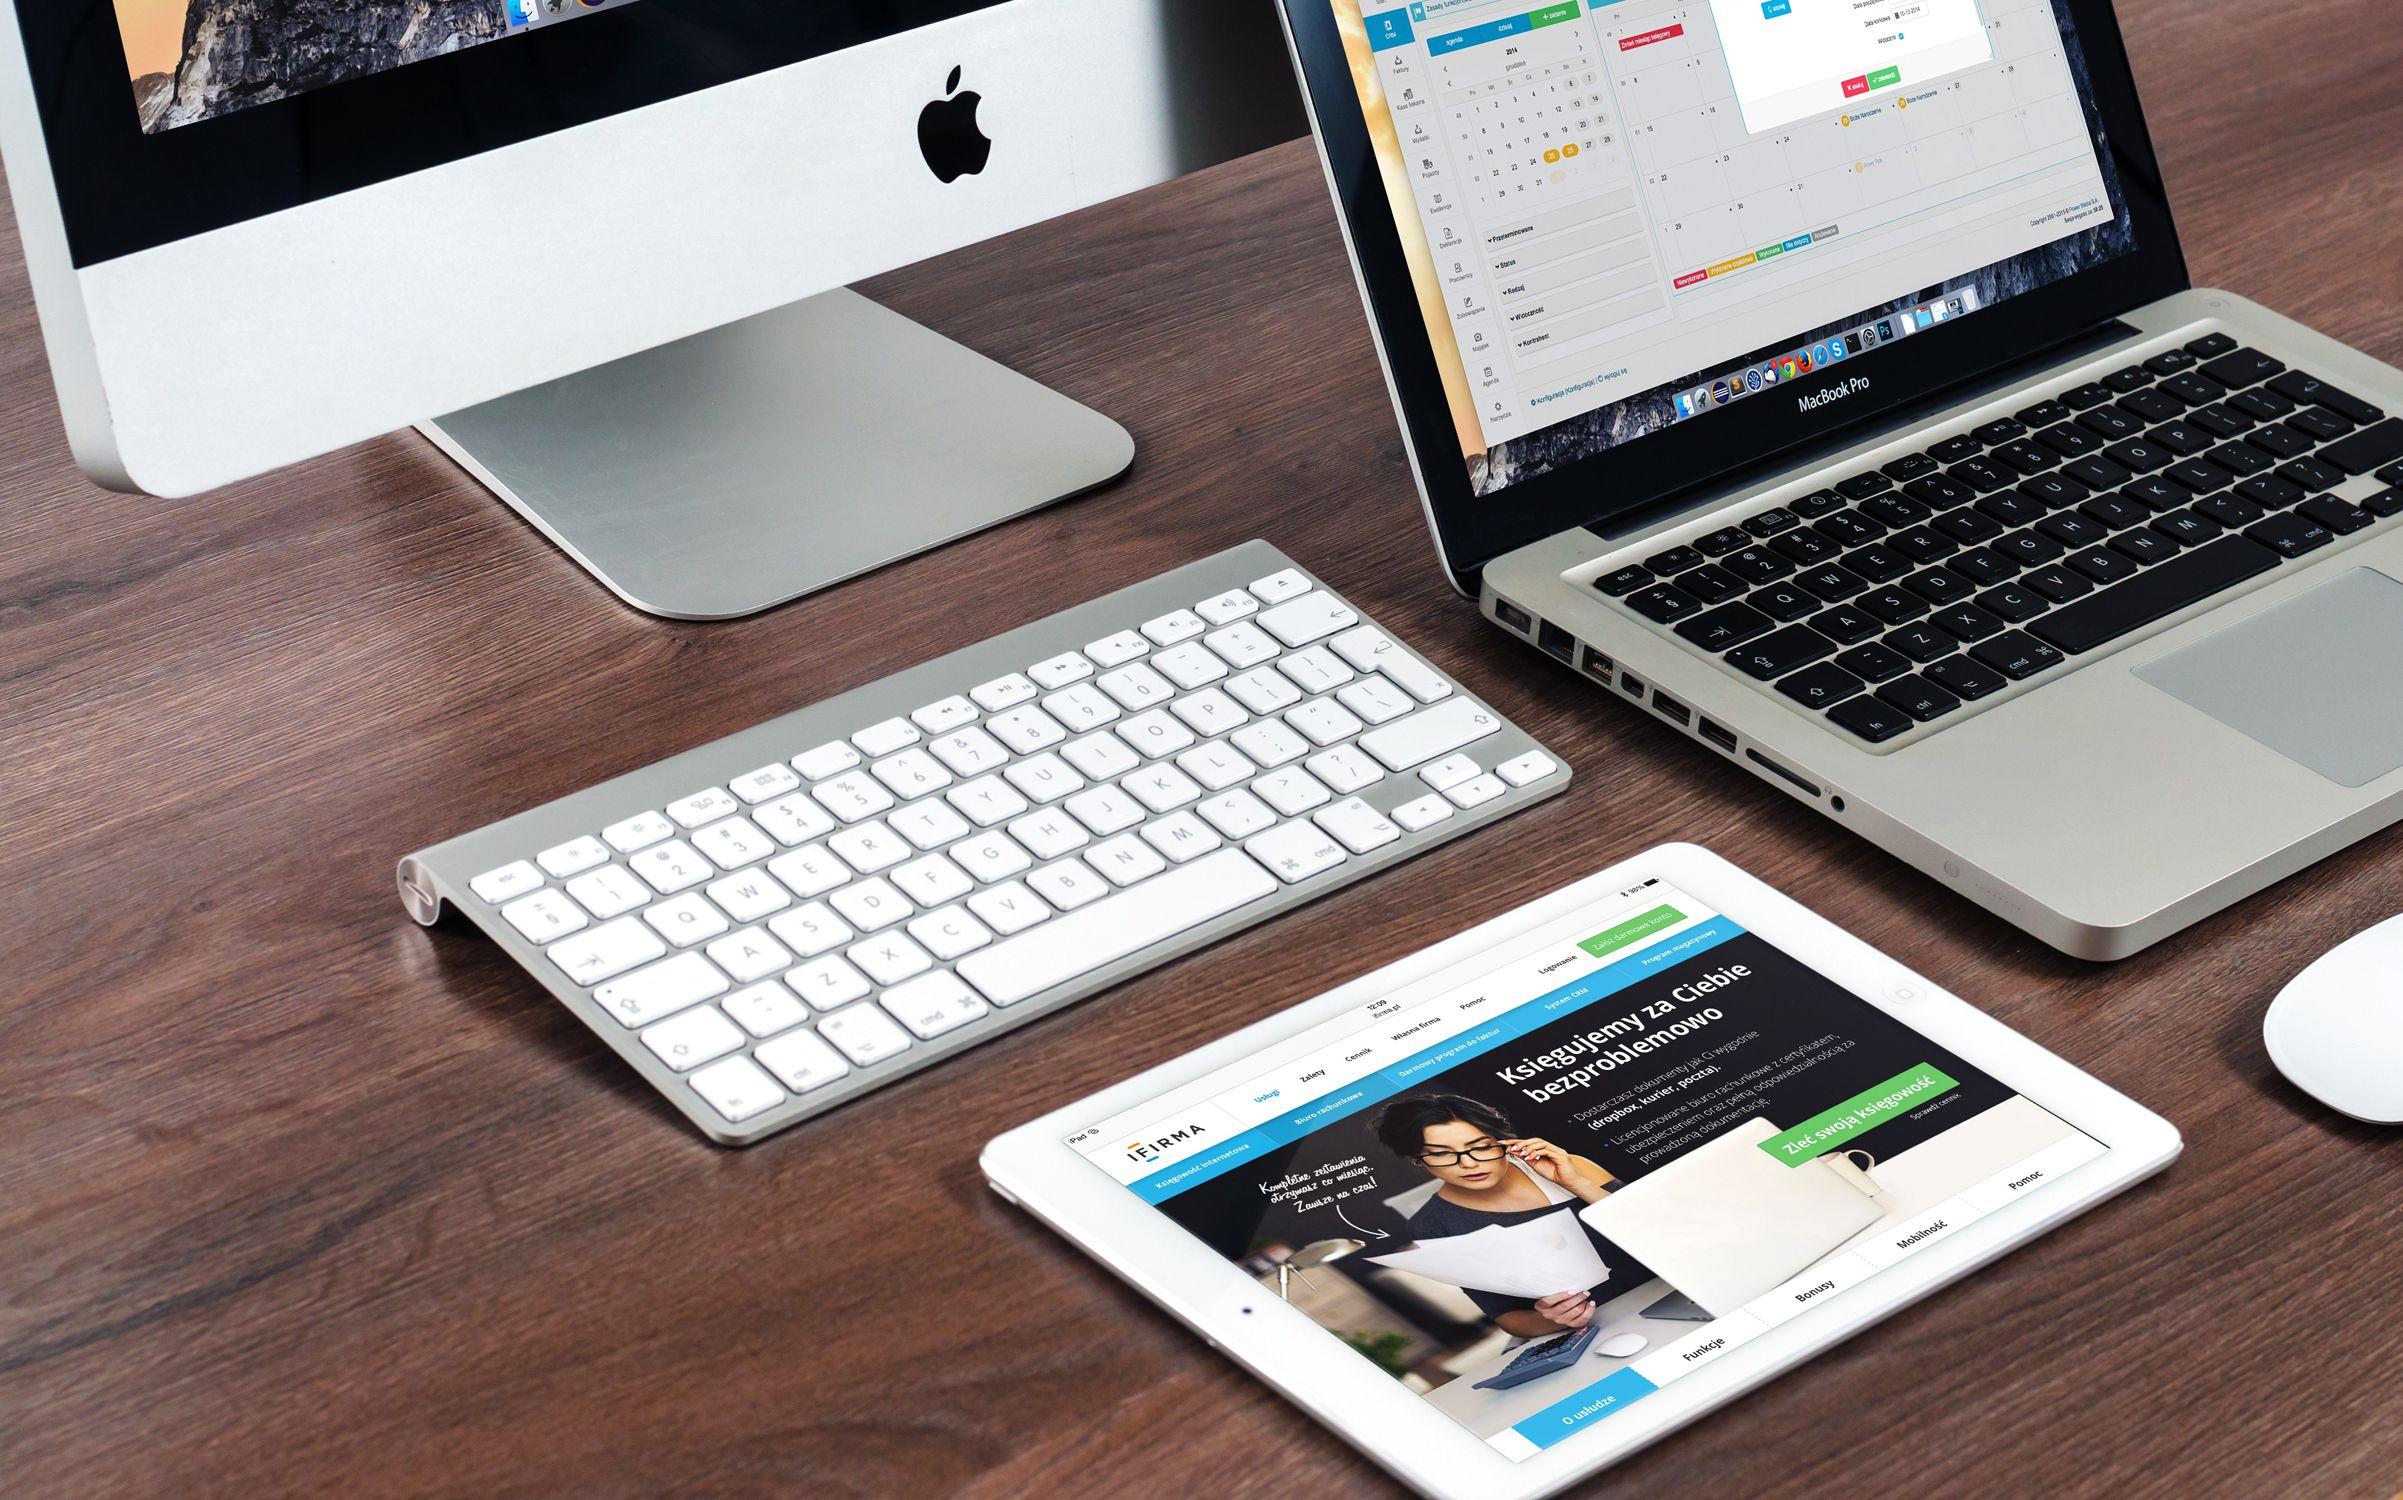 macbook pro anti virus